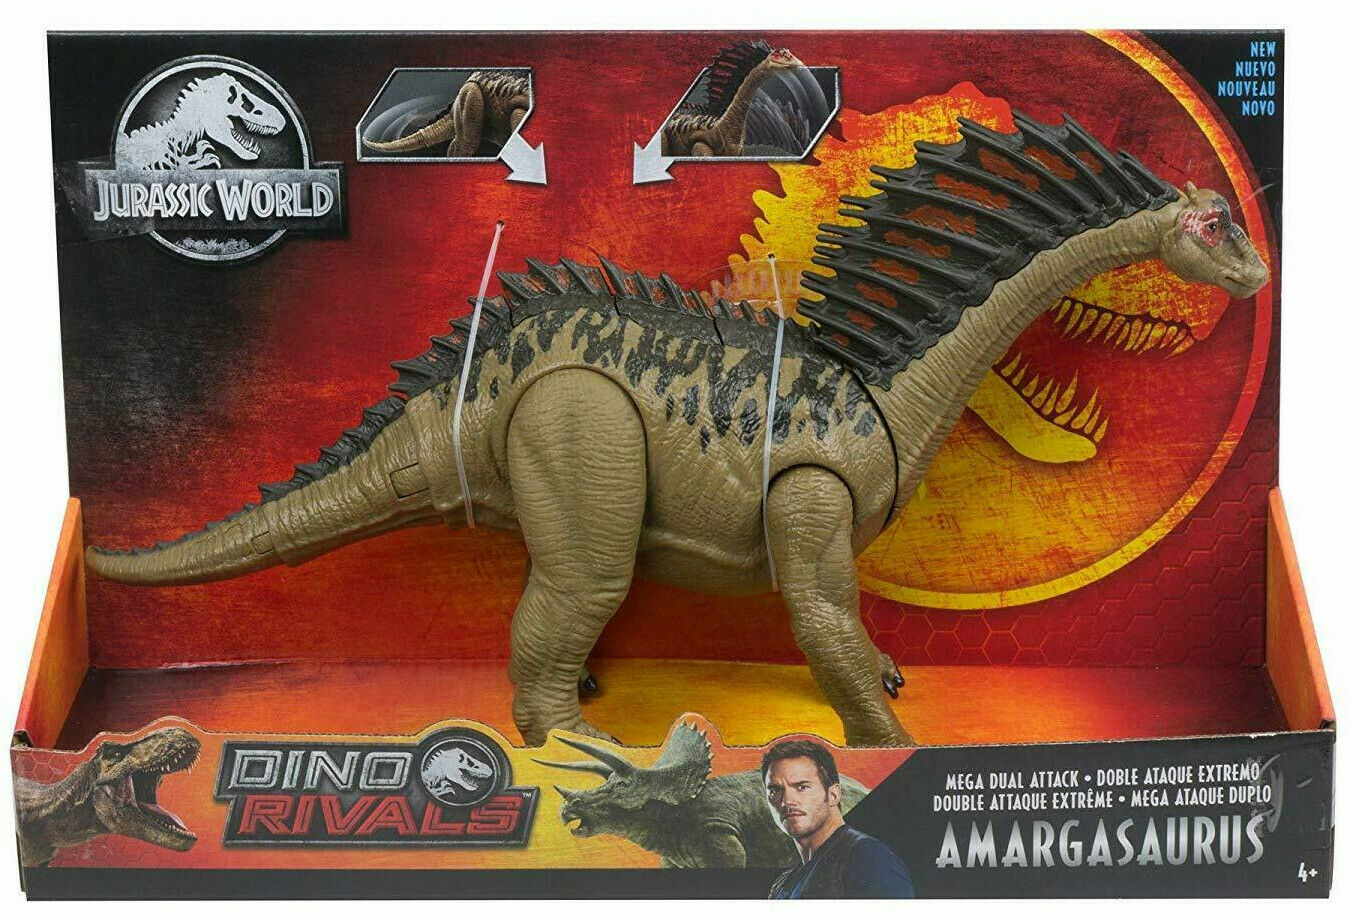 Jurassic World Mega doble ataque Amargasaurus Figura Dinosaurio Dinosaurio rivales